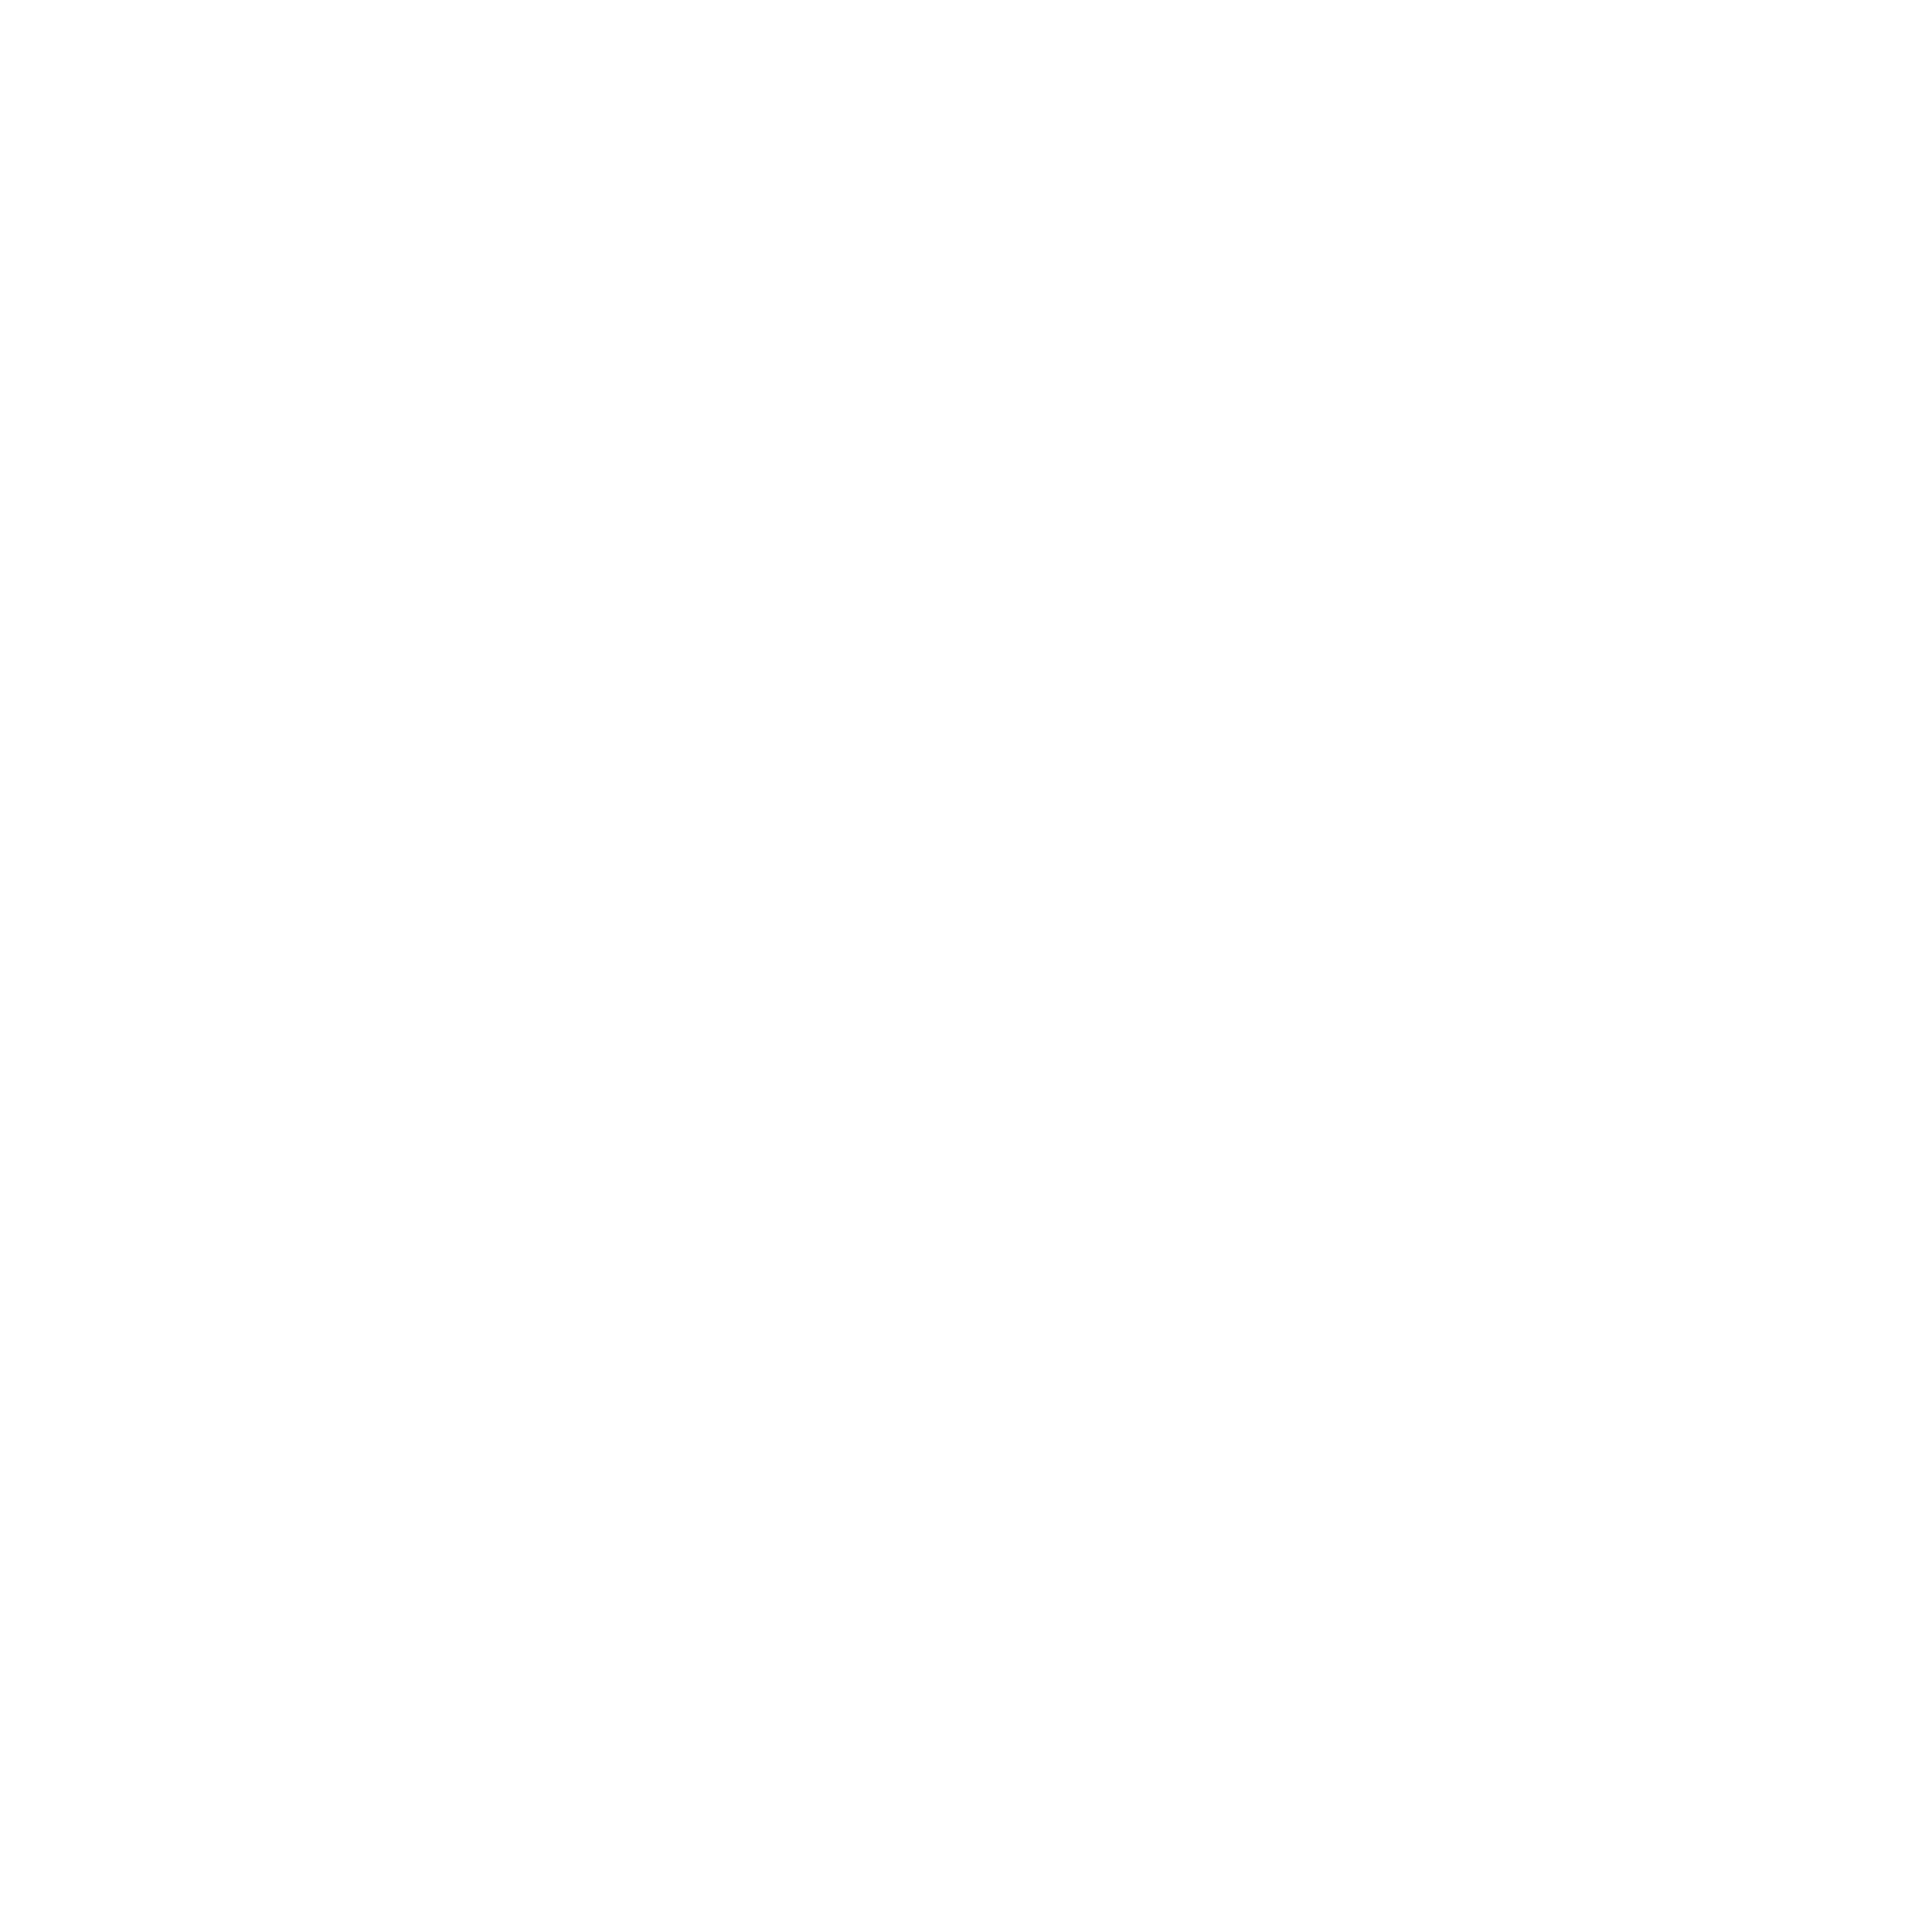 White circle frame png. Round border transparent clip